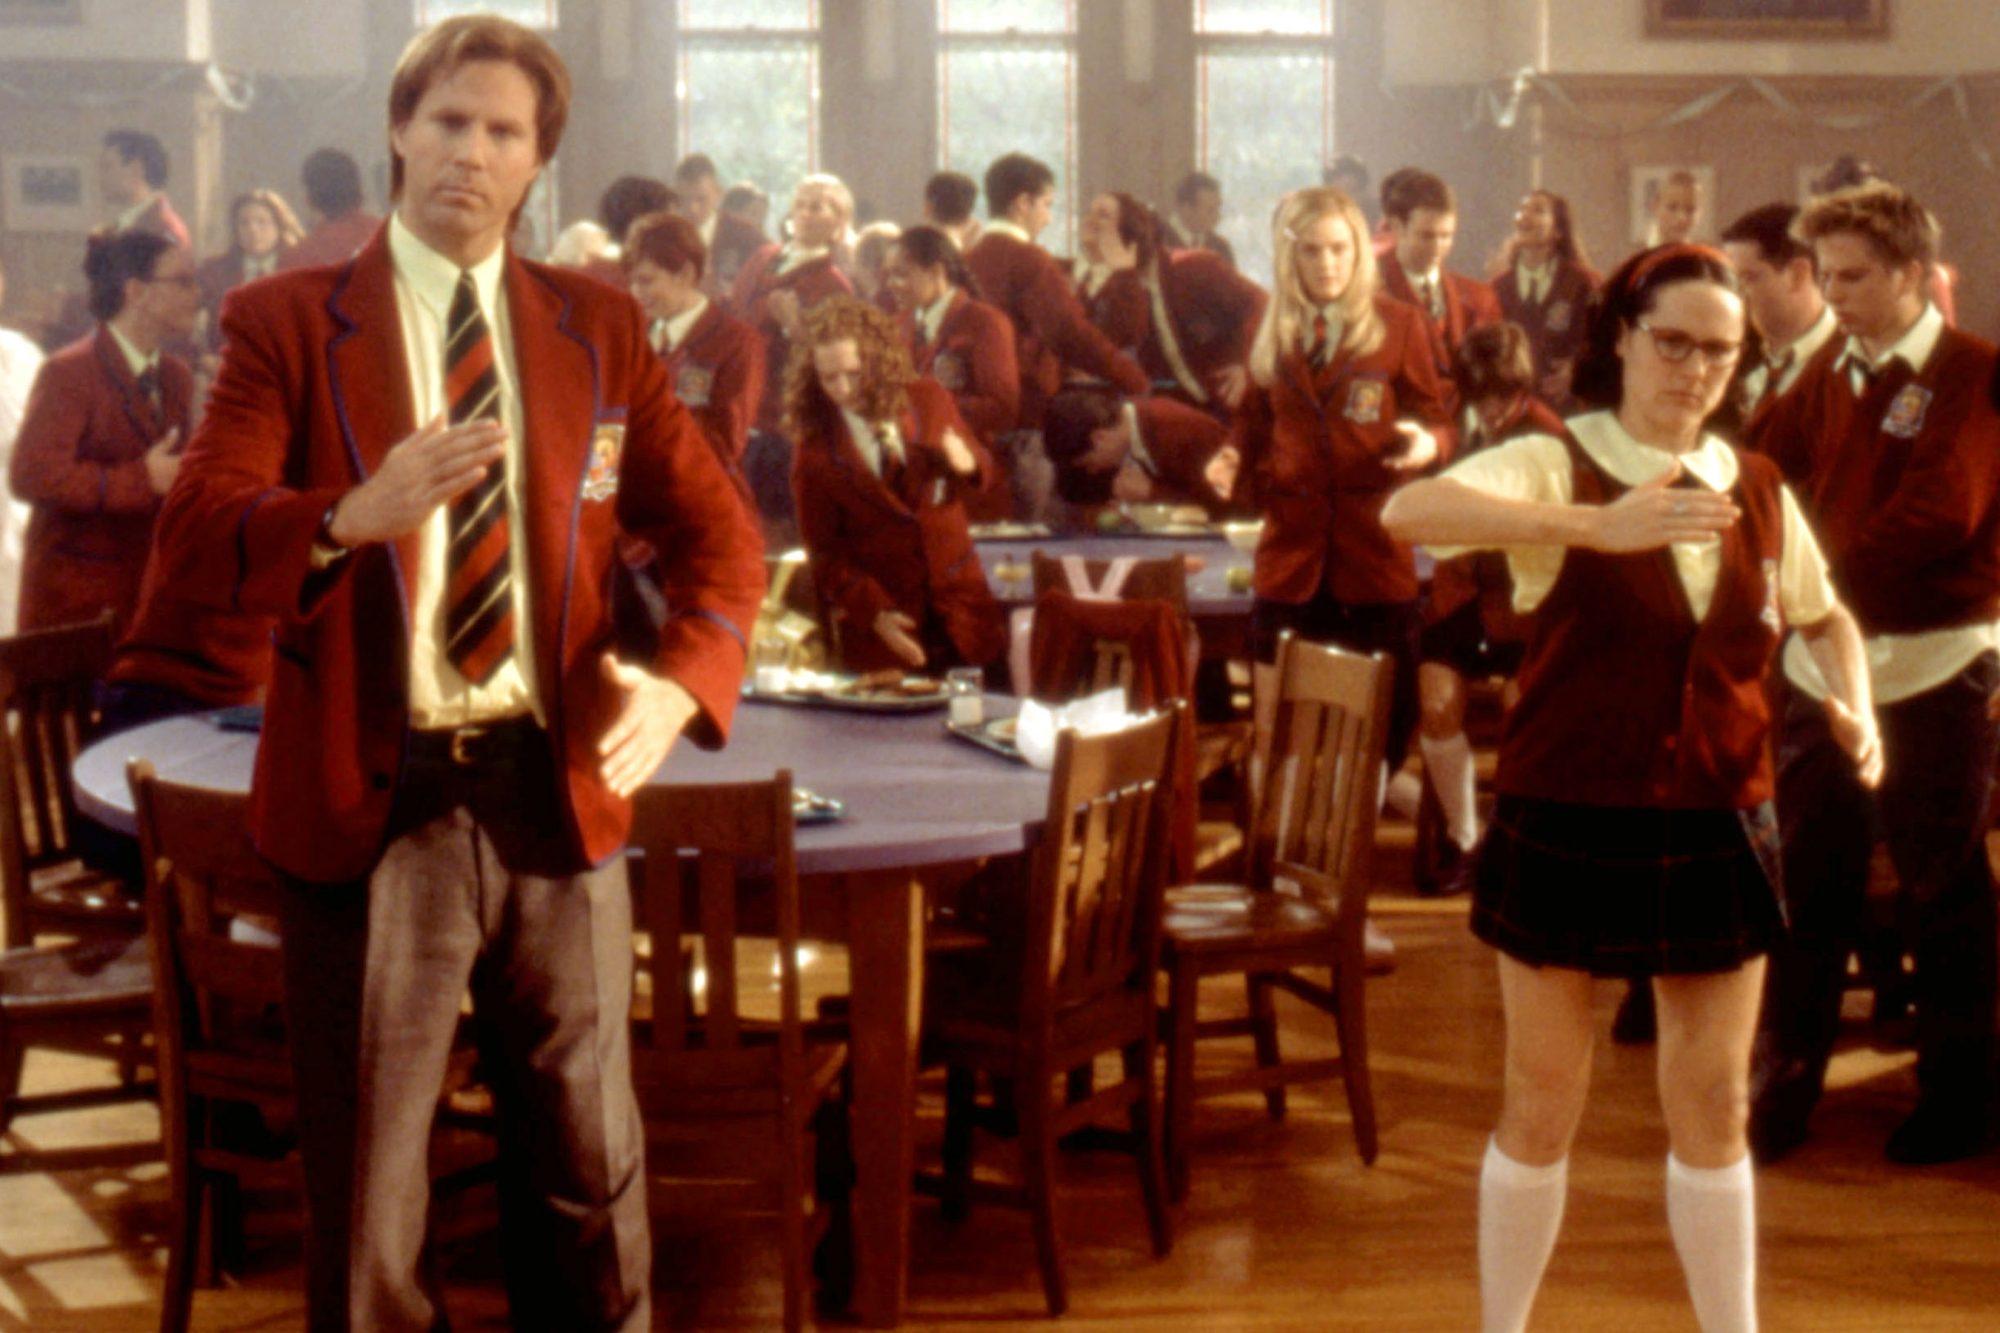 SUPERSTAR, Will Ferrell, Molly Shannon, 1999, (c)Paramount/courtesy Everett Collection